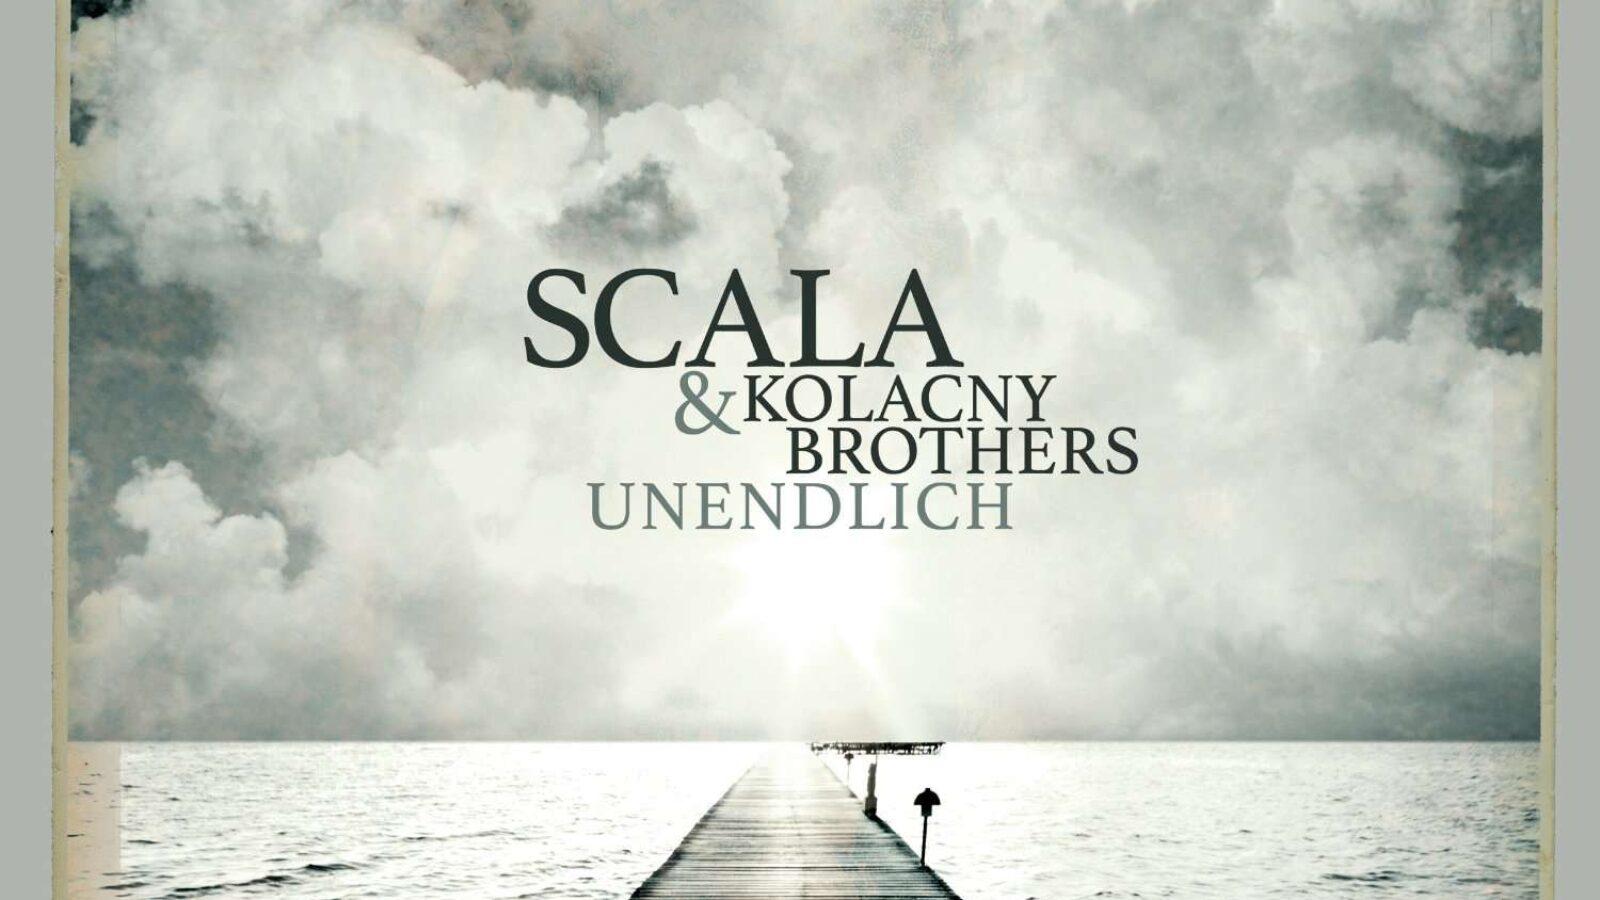 OXMOX CD-Tipp: SCALA & KOLACNY BROTHERS Unendlich